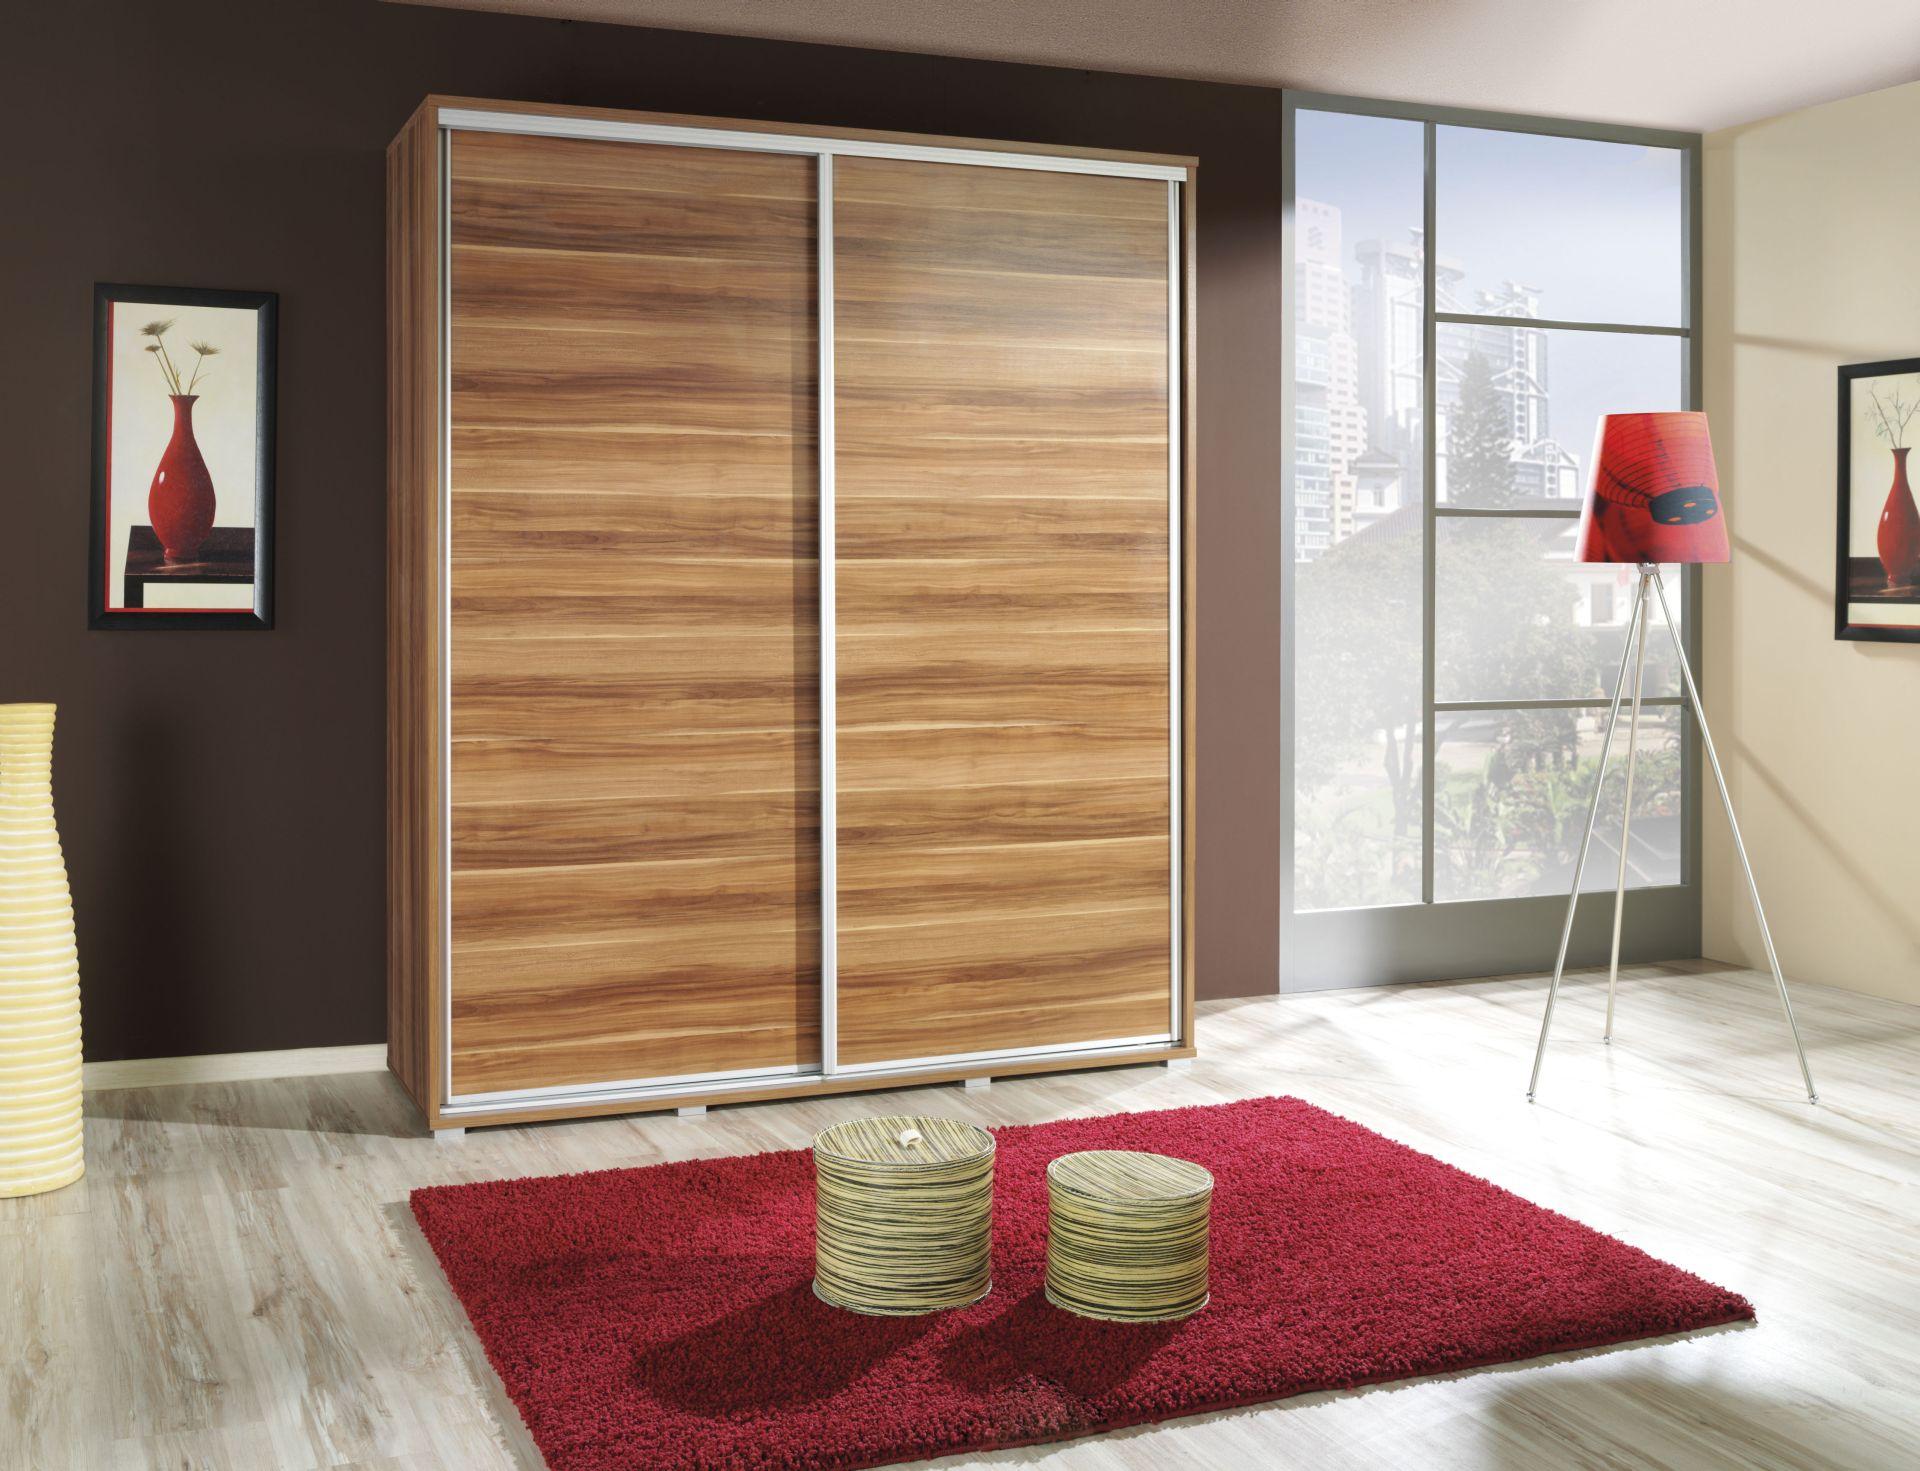 szafa przesuwna wroc aw 155 cm p155. Black Bedroom Furniture Sets. Home Design Ideas